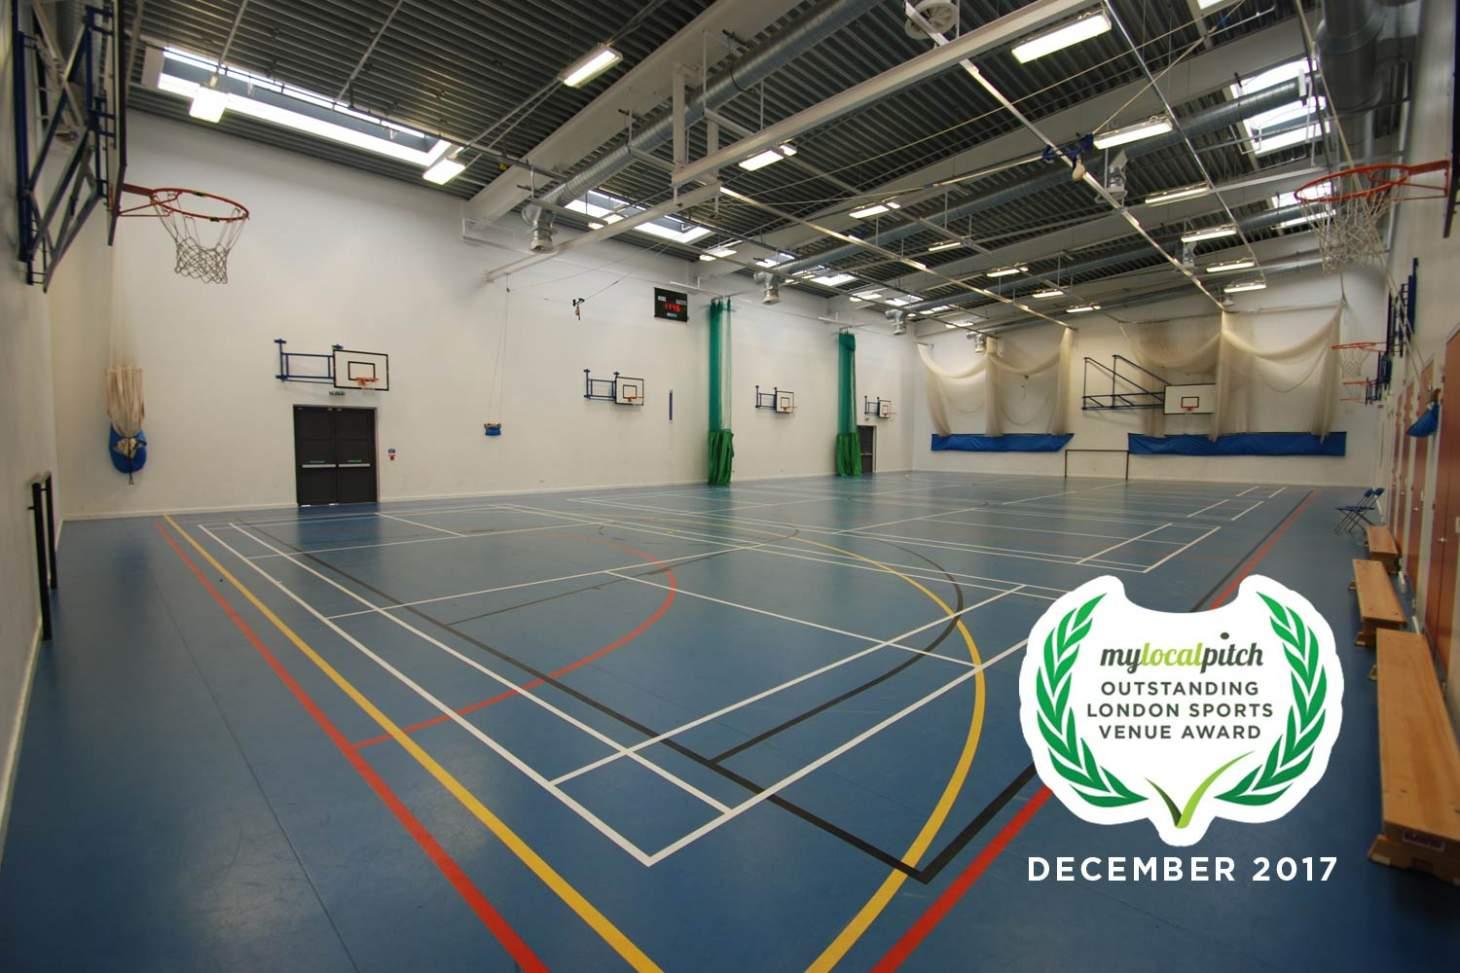 Castle Green Leisure Centre Indoor basketball court